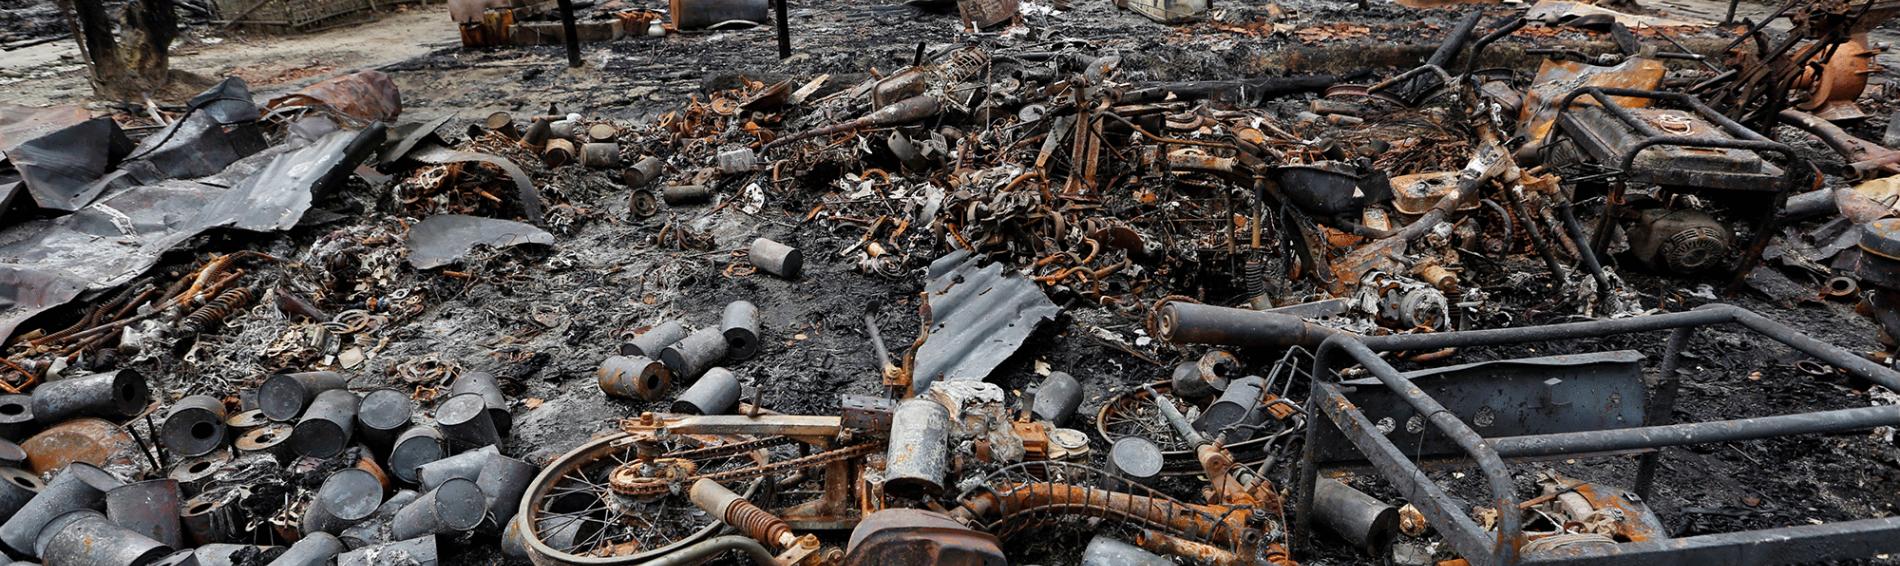 Trümmer in Myanmar